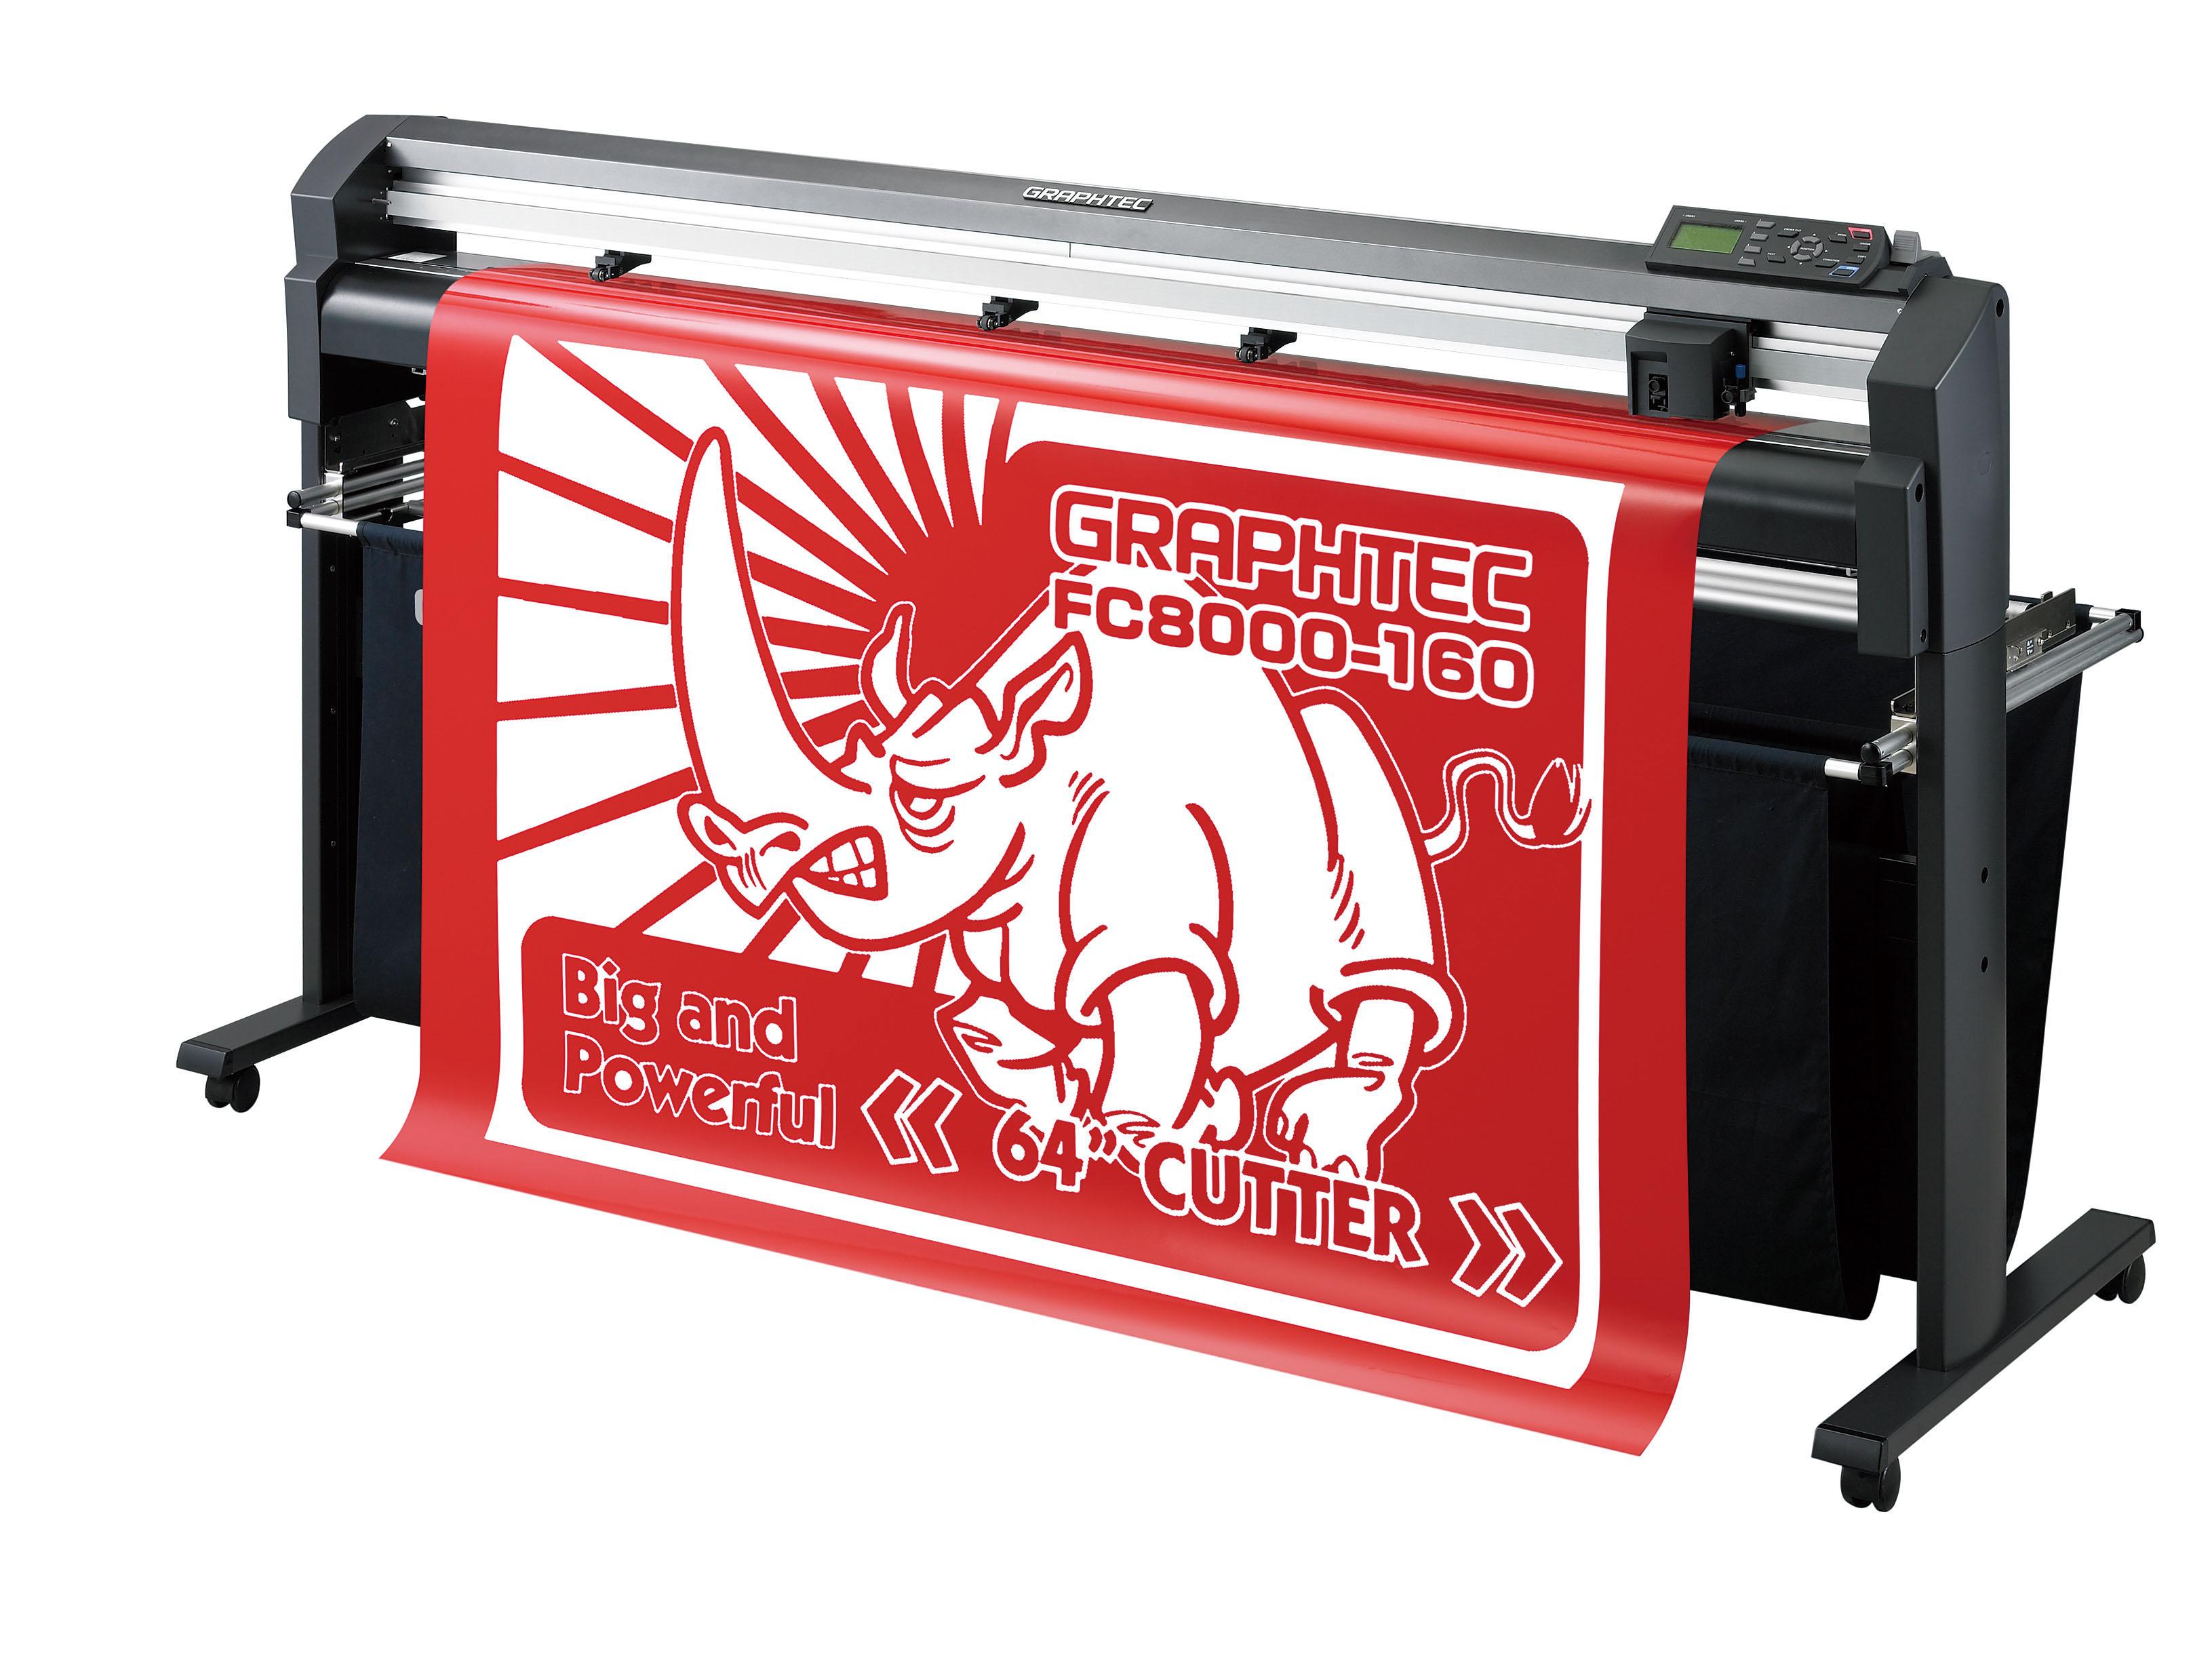 Graphtec FC-9000